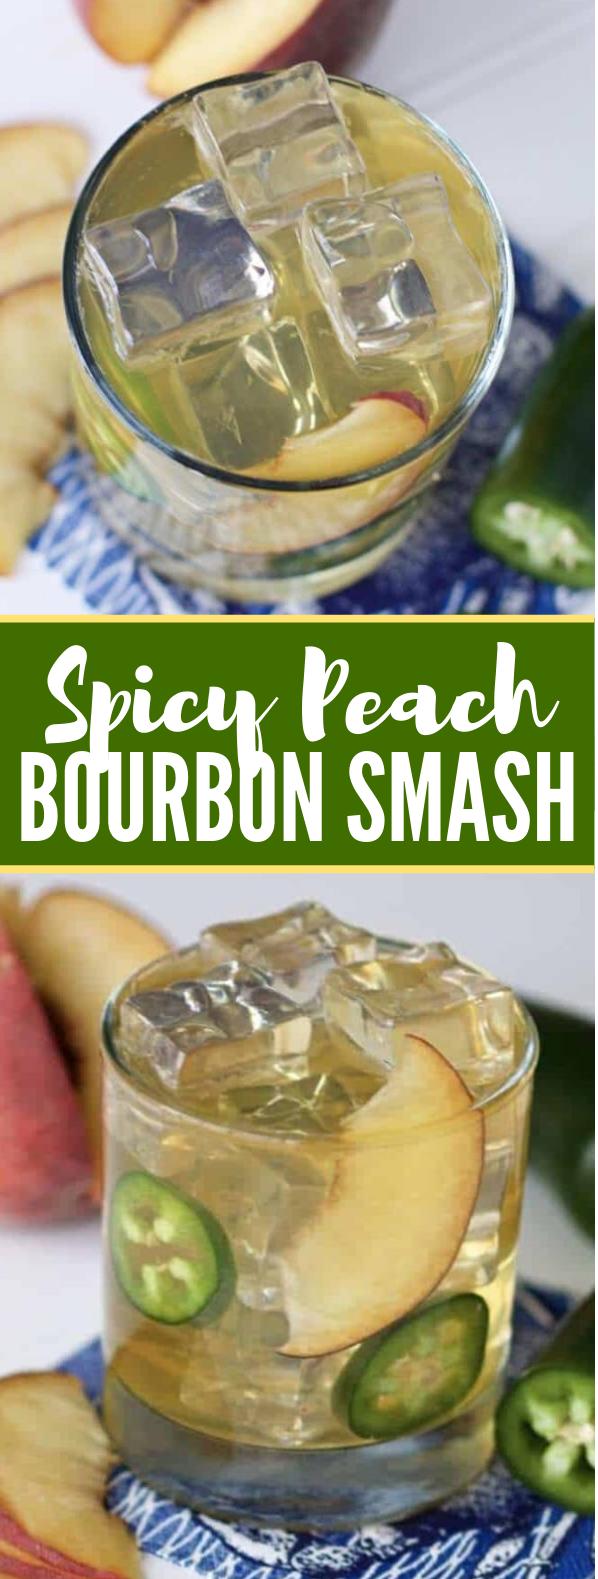 Spicy Peach Bourbon Smash Cocktail Recipe #drinks #whiskey